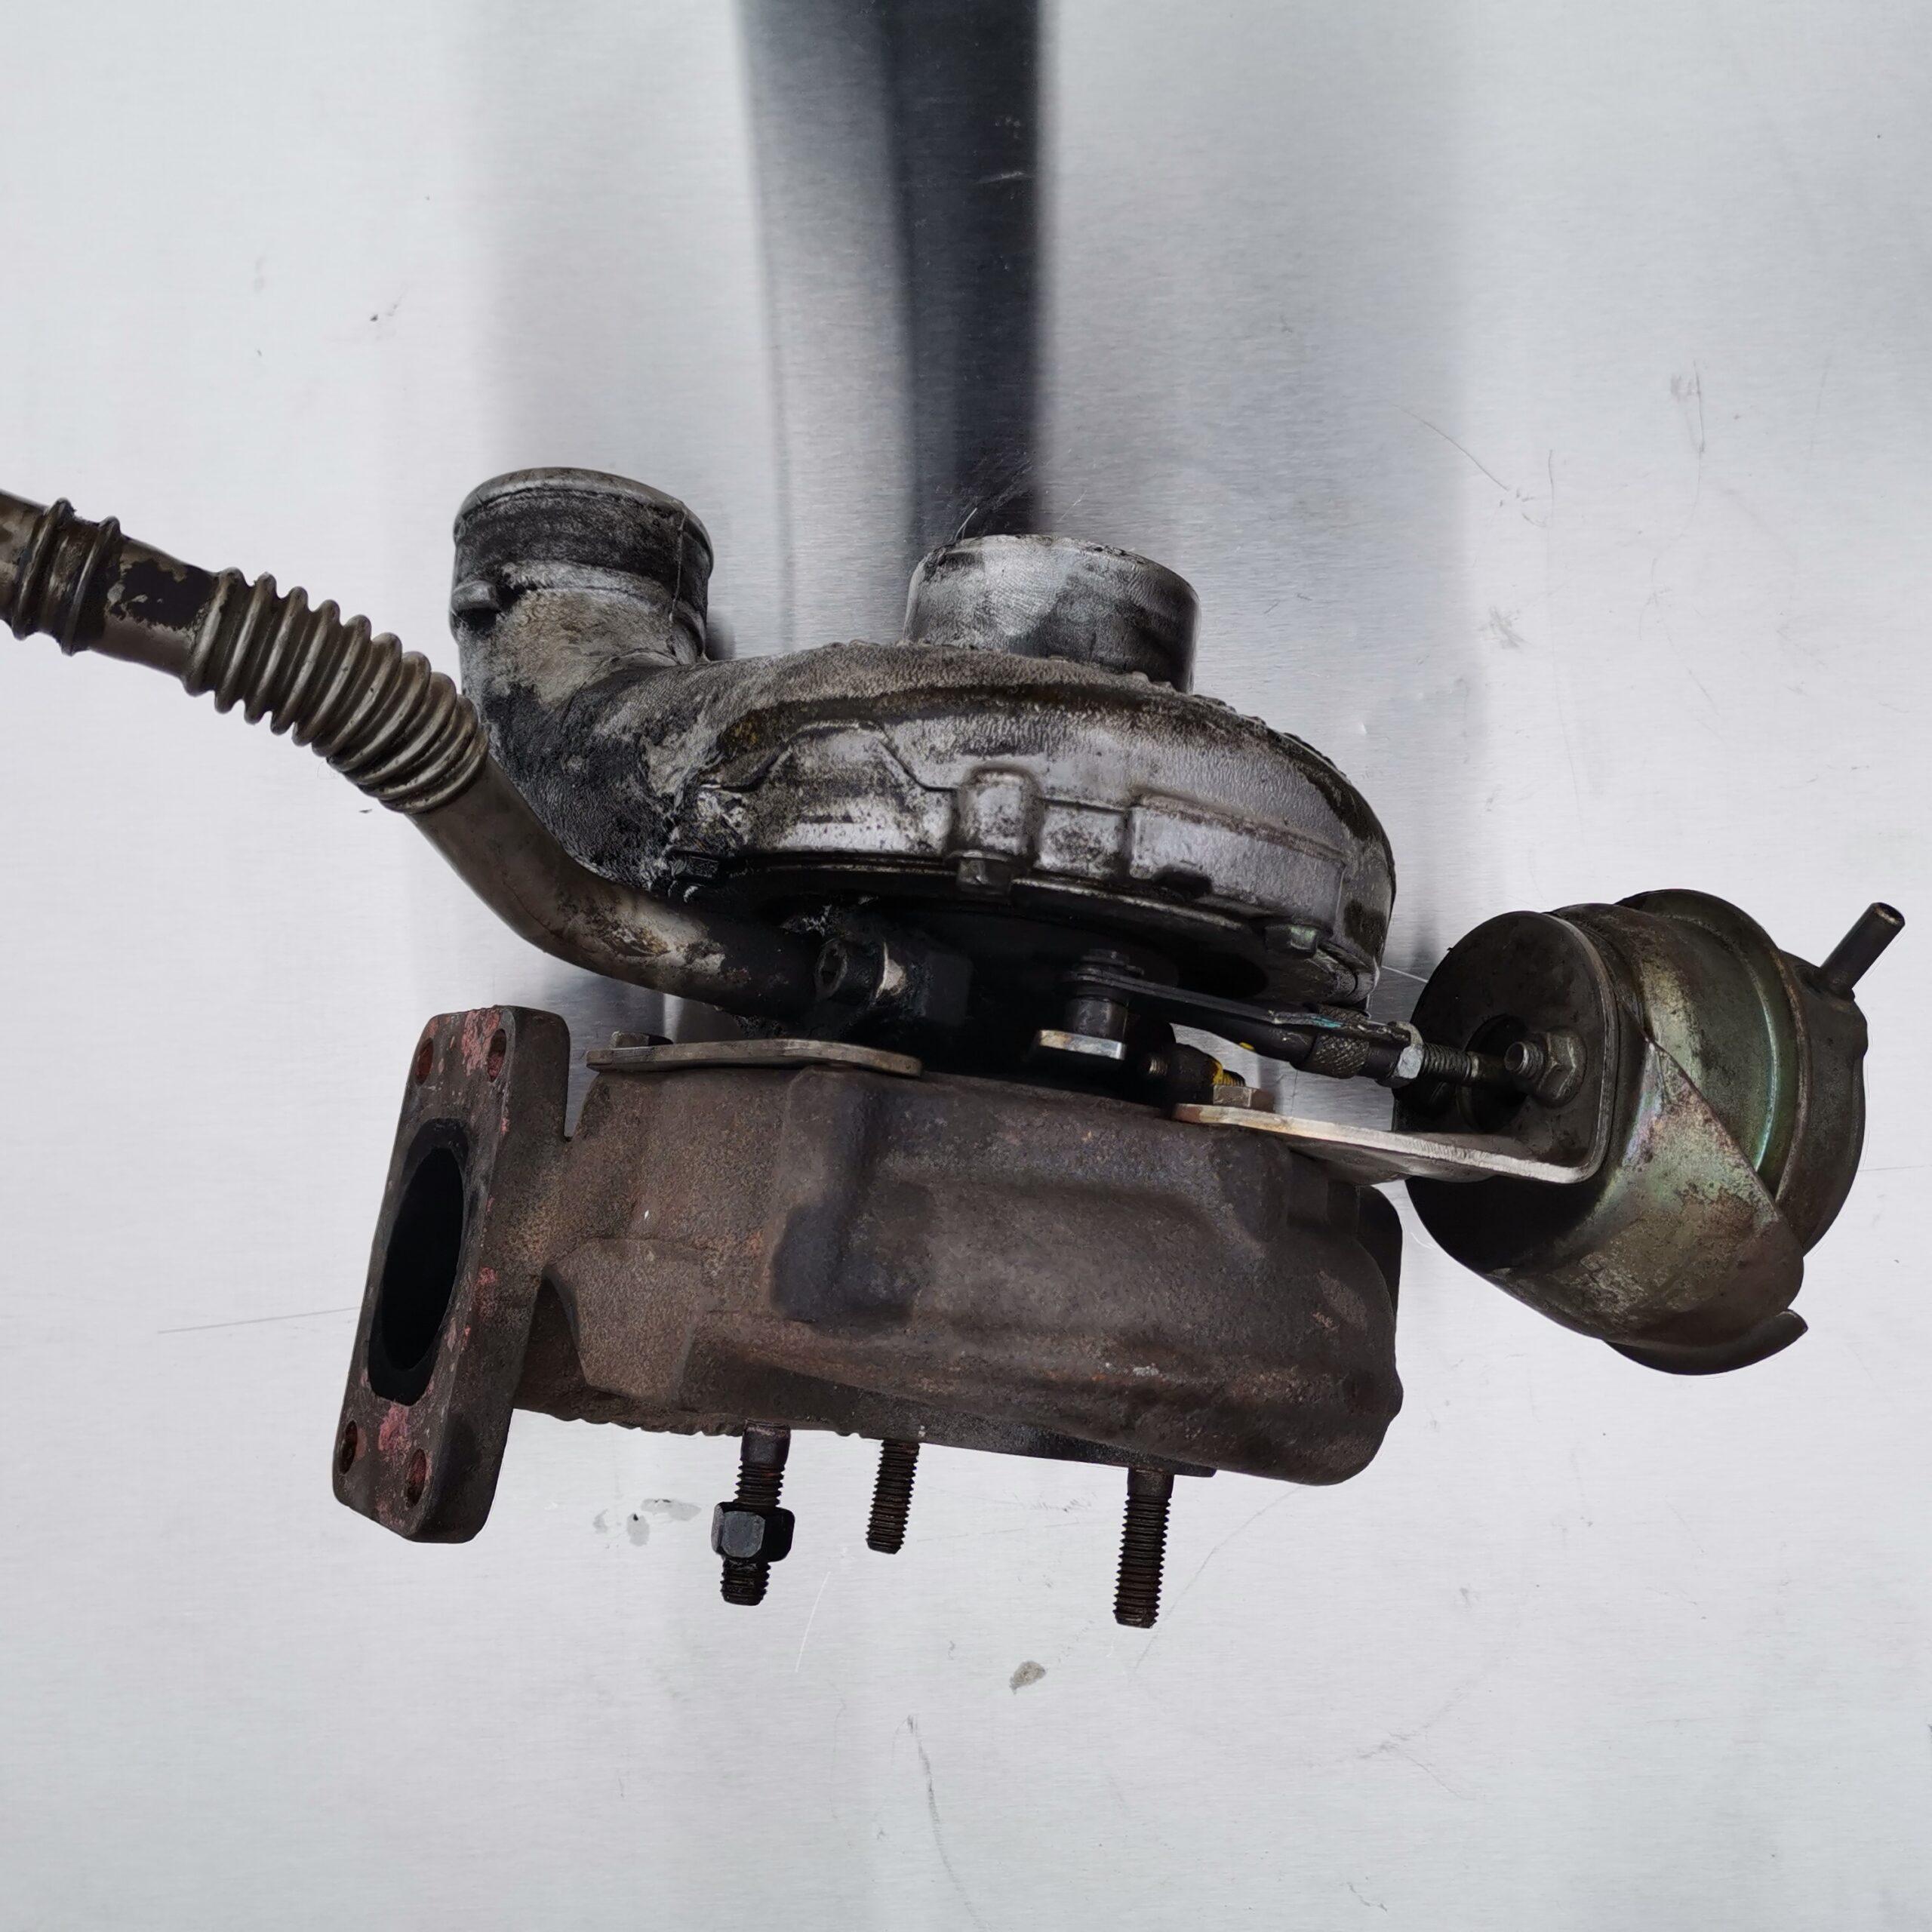 Пришла турбина Audi A6 2.5 TDI на ремонт в turboday